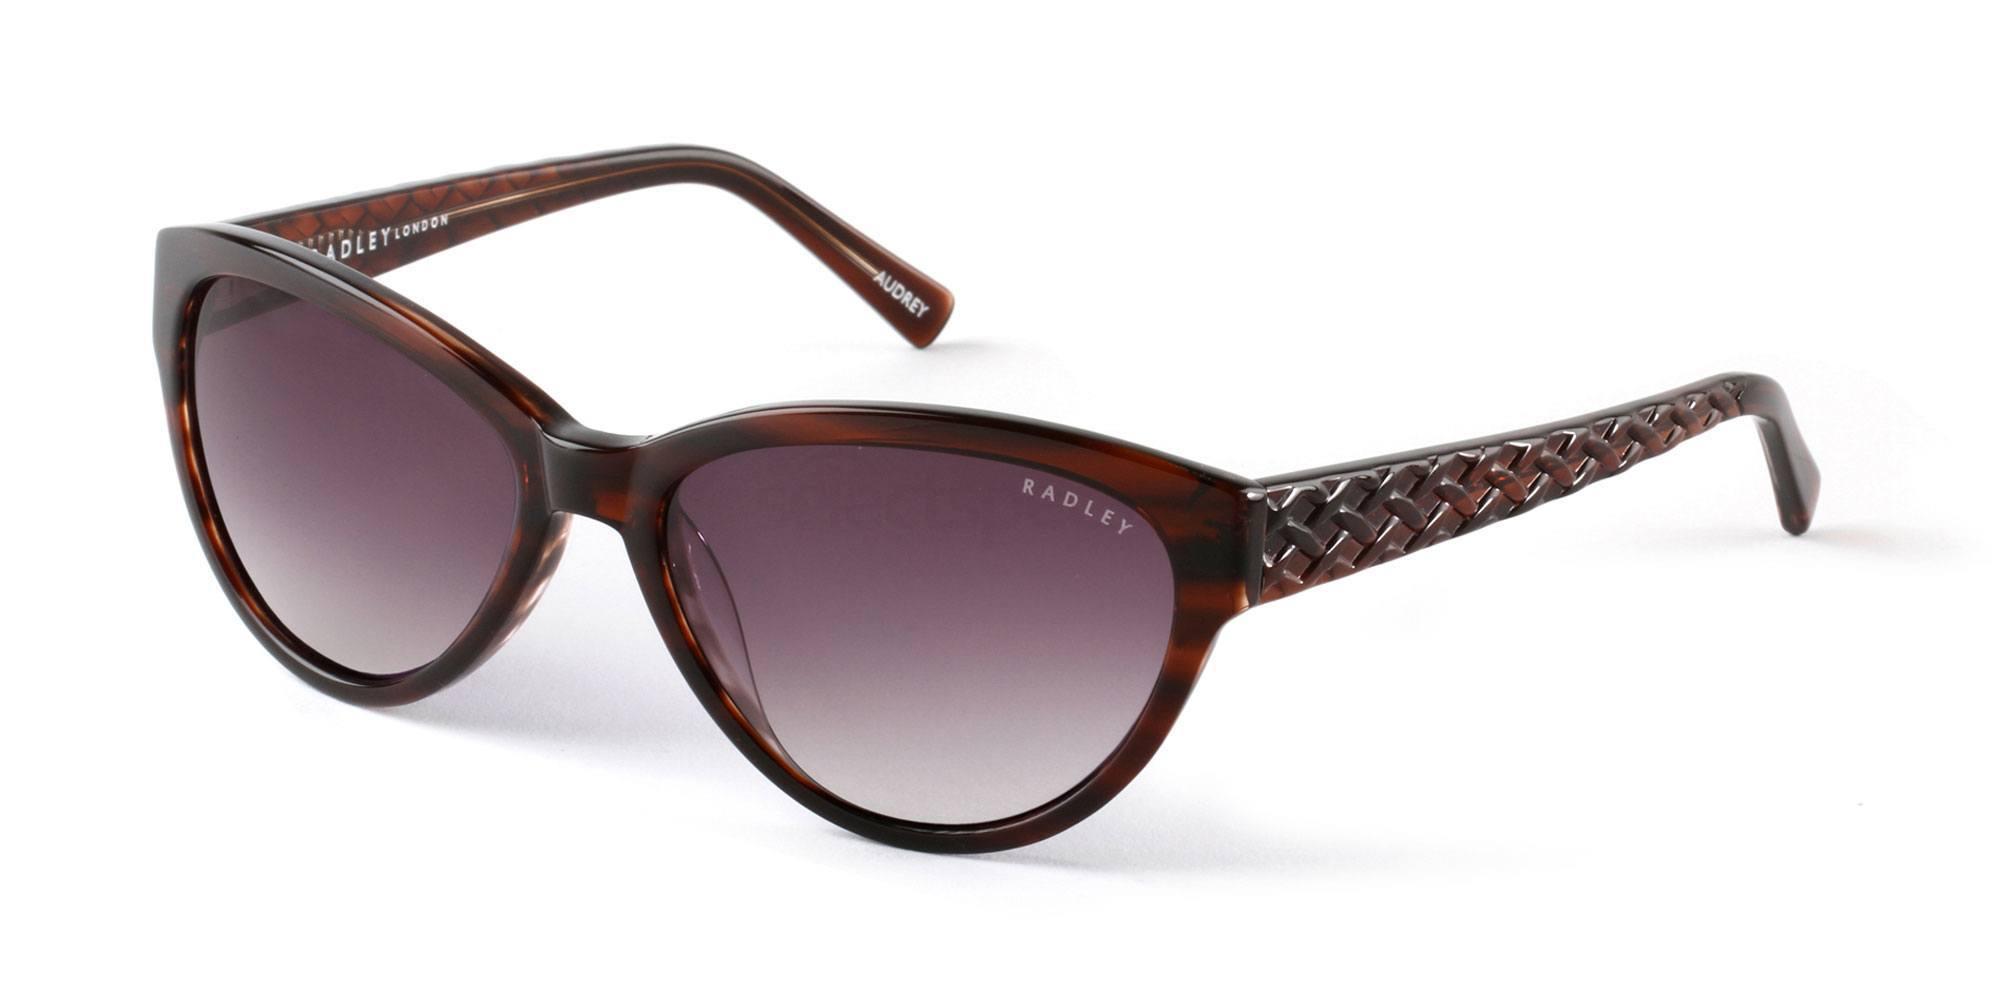 103 RDS-AUDREY-RX Sunglasses, Radley London